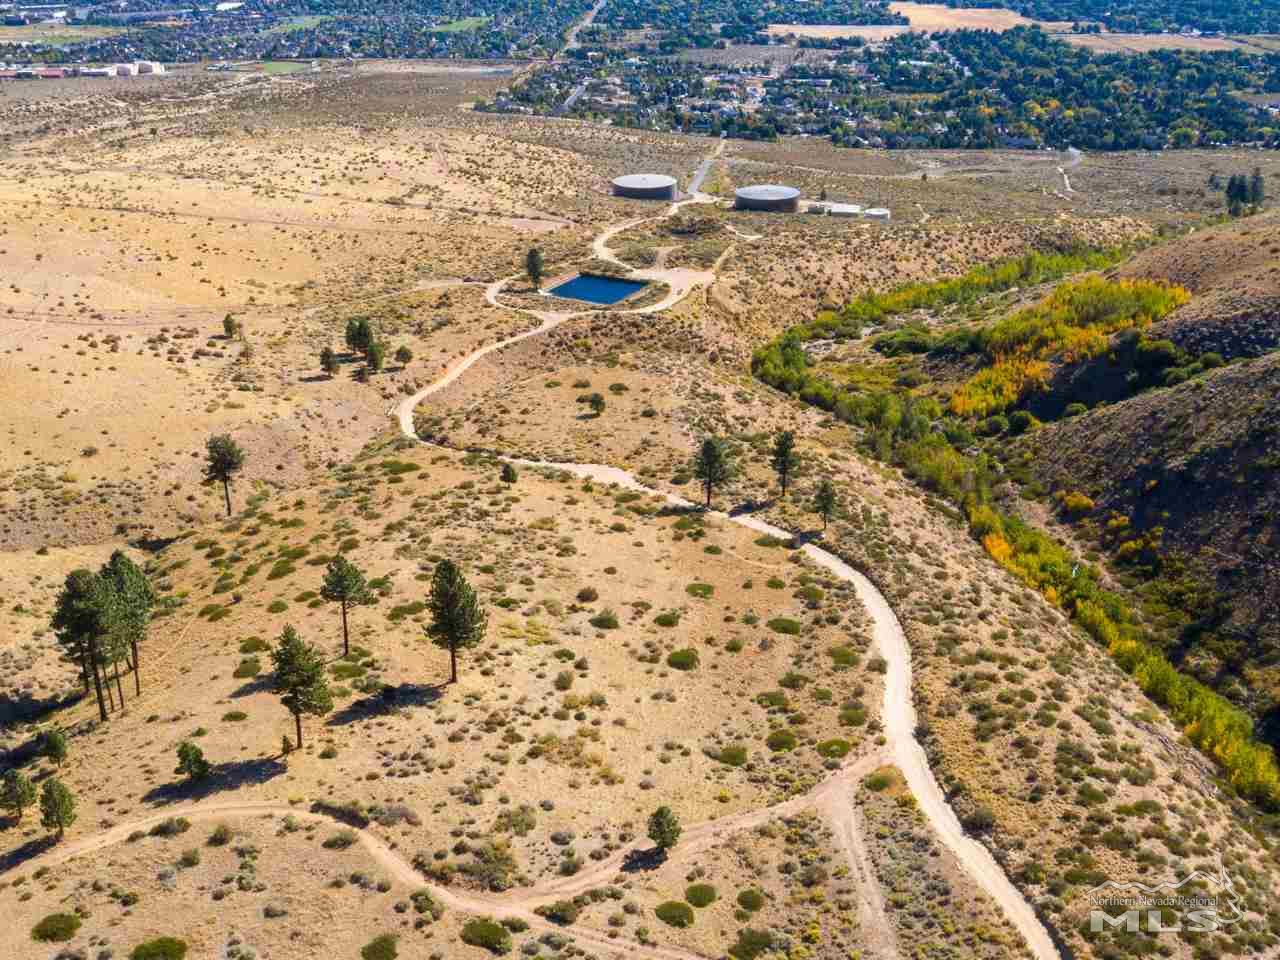 Image for 0 Ash Canyon, Carson City, NV 89703